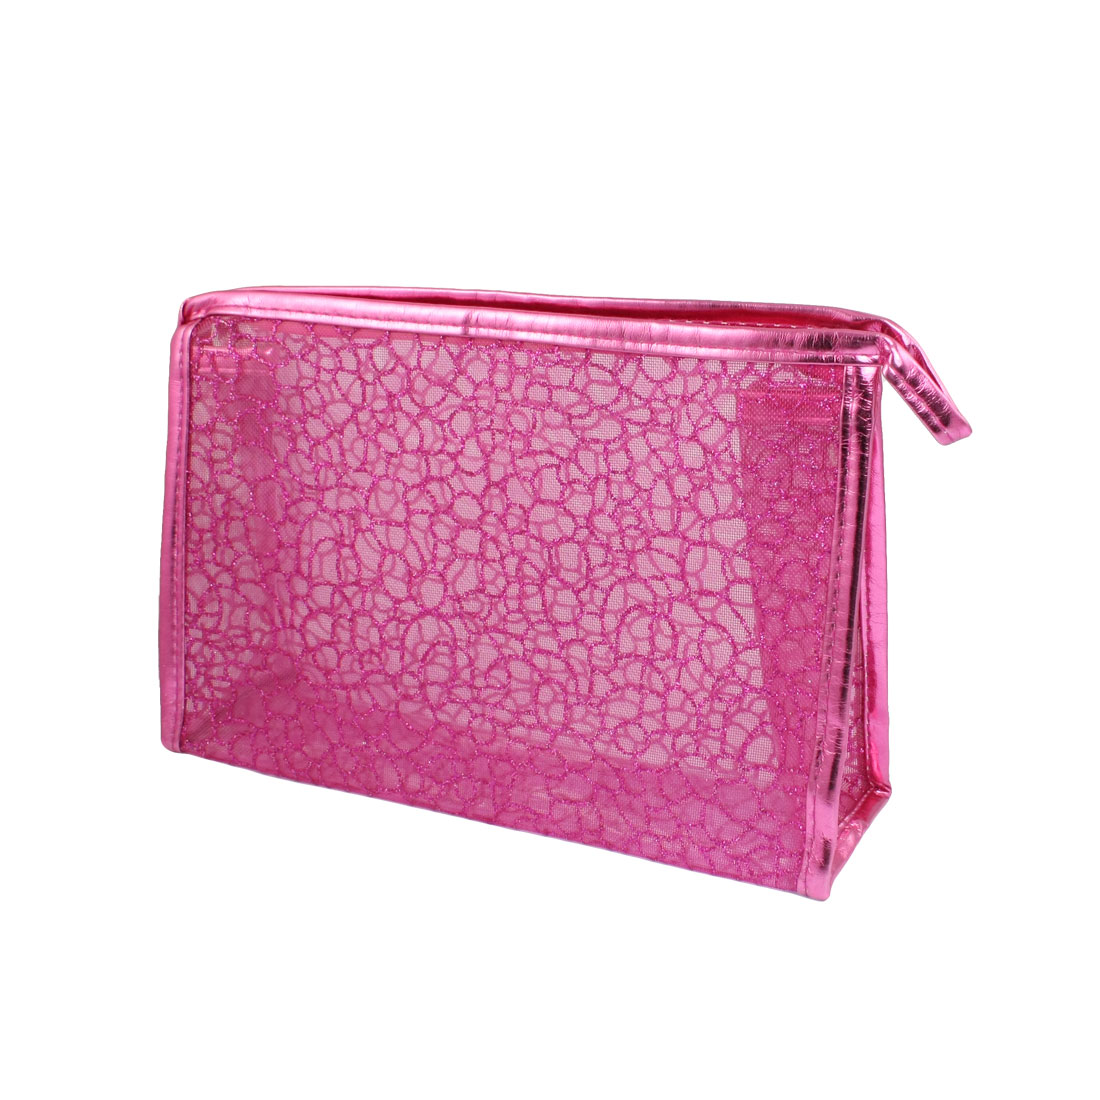 Fuchsia PU Plastic Glittery Mesh Zipper Makeup Cosmetic Bag for Lady Girls